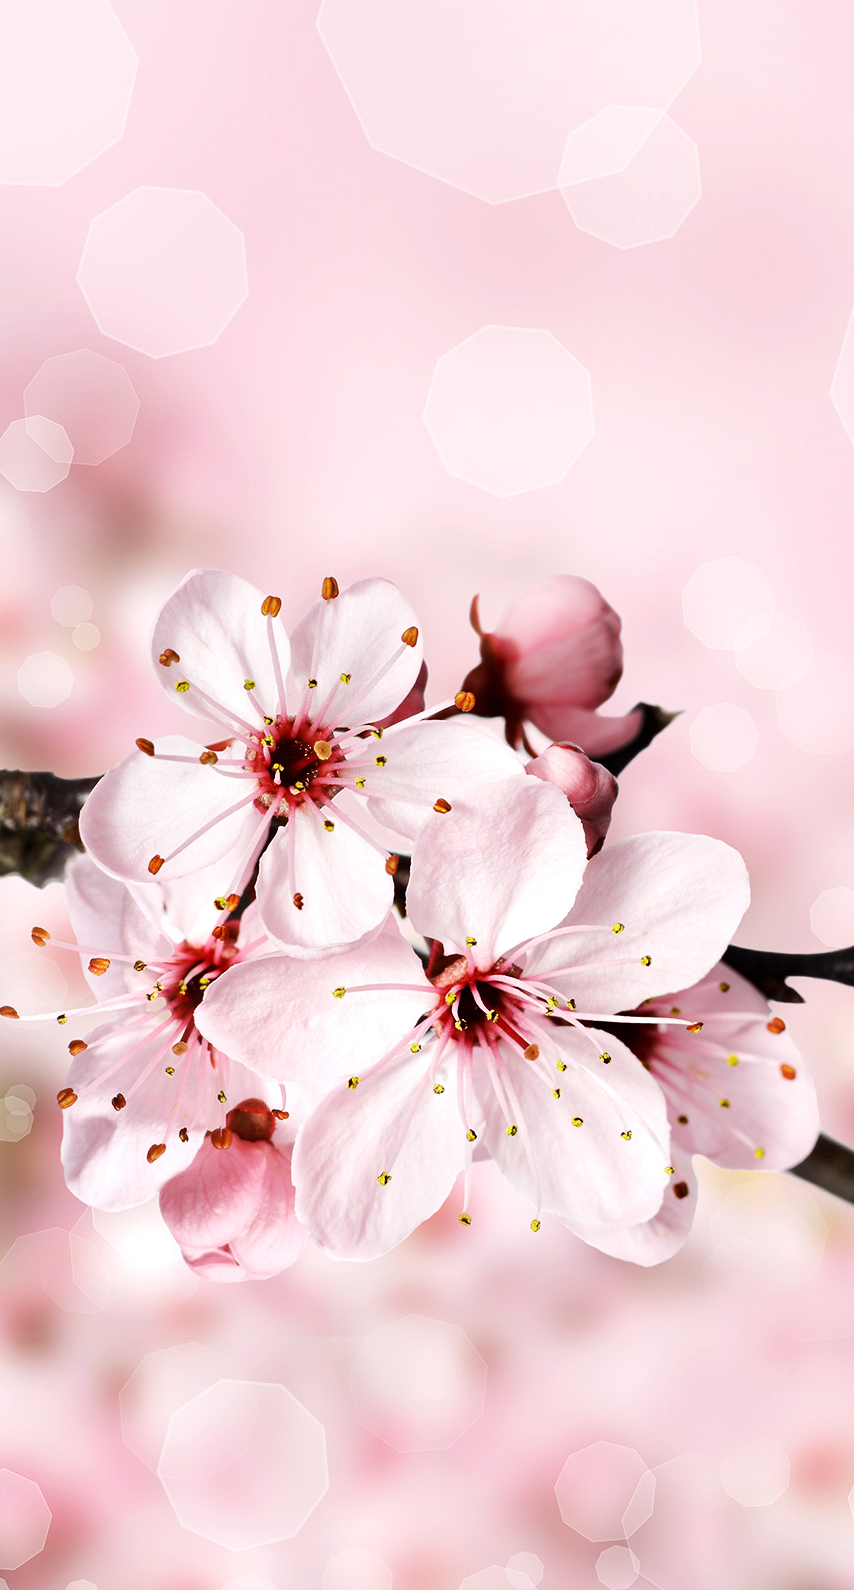 garden, blooming, petal, season, growth, plum, bud, apricot